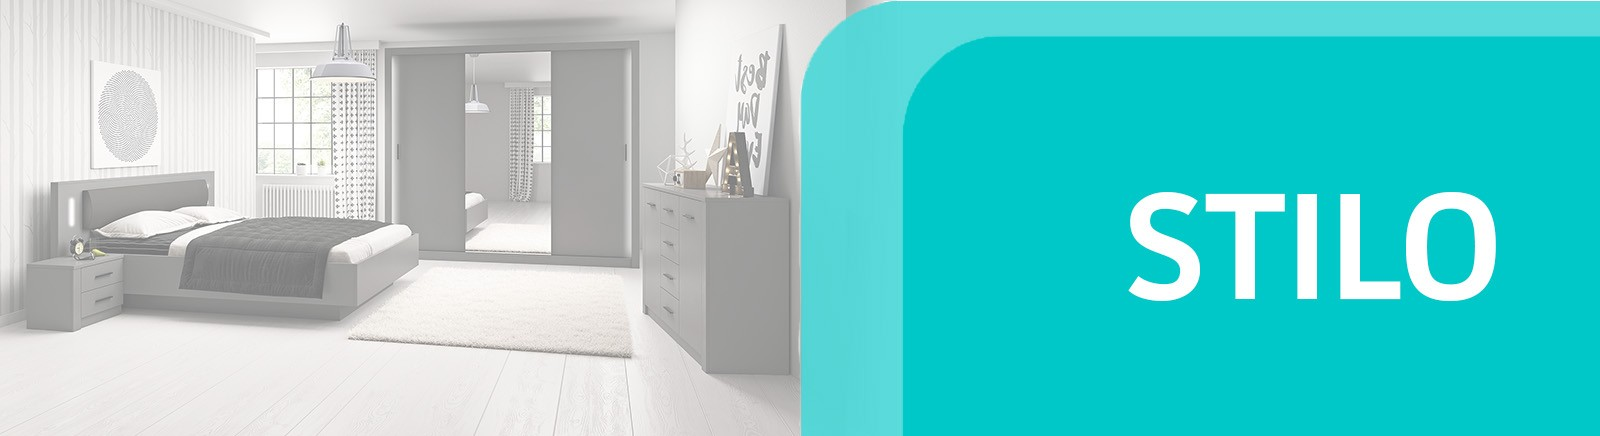 Stilo bedroom set